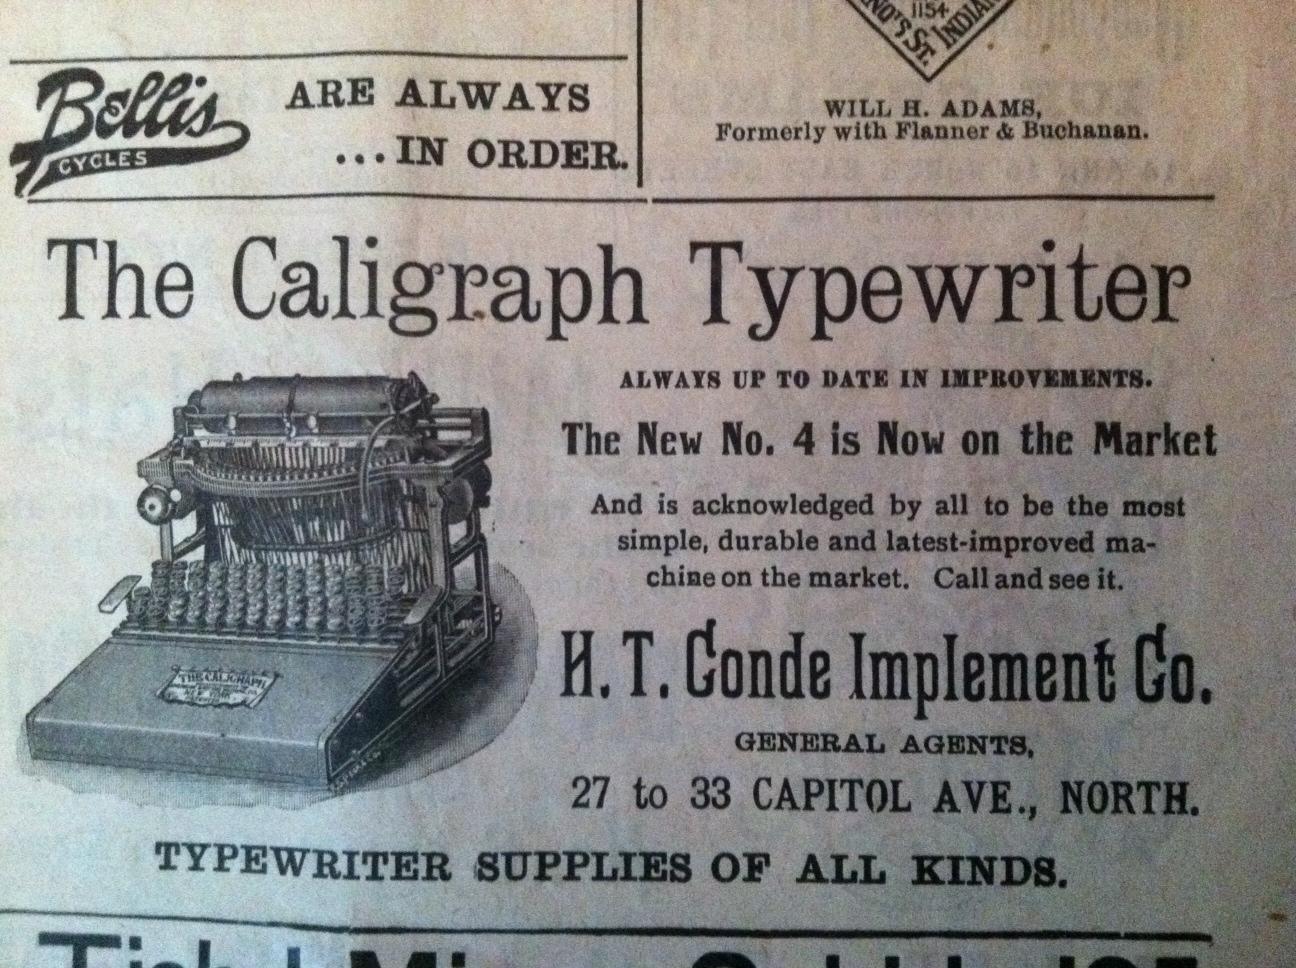 Sunday Adverts: Caligraph Typewriter